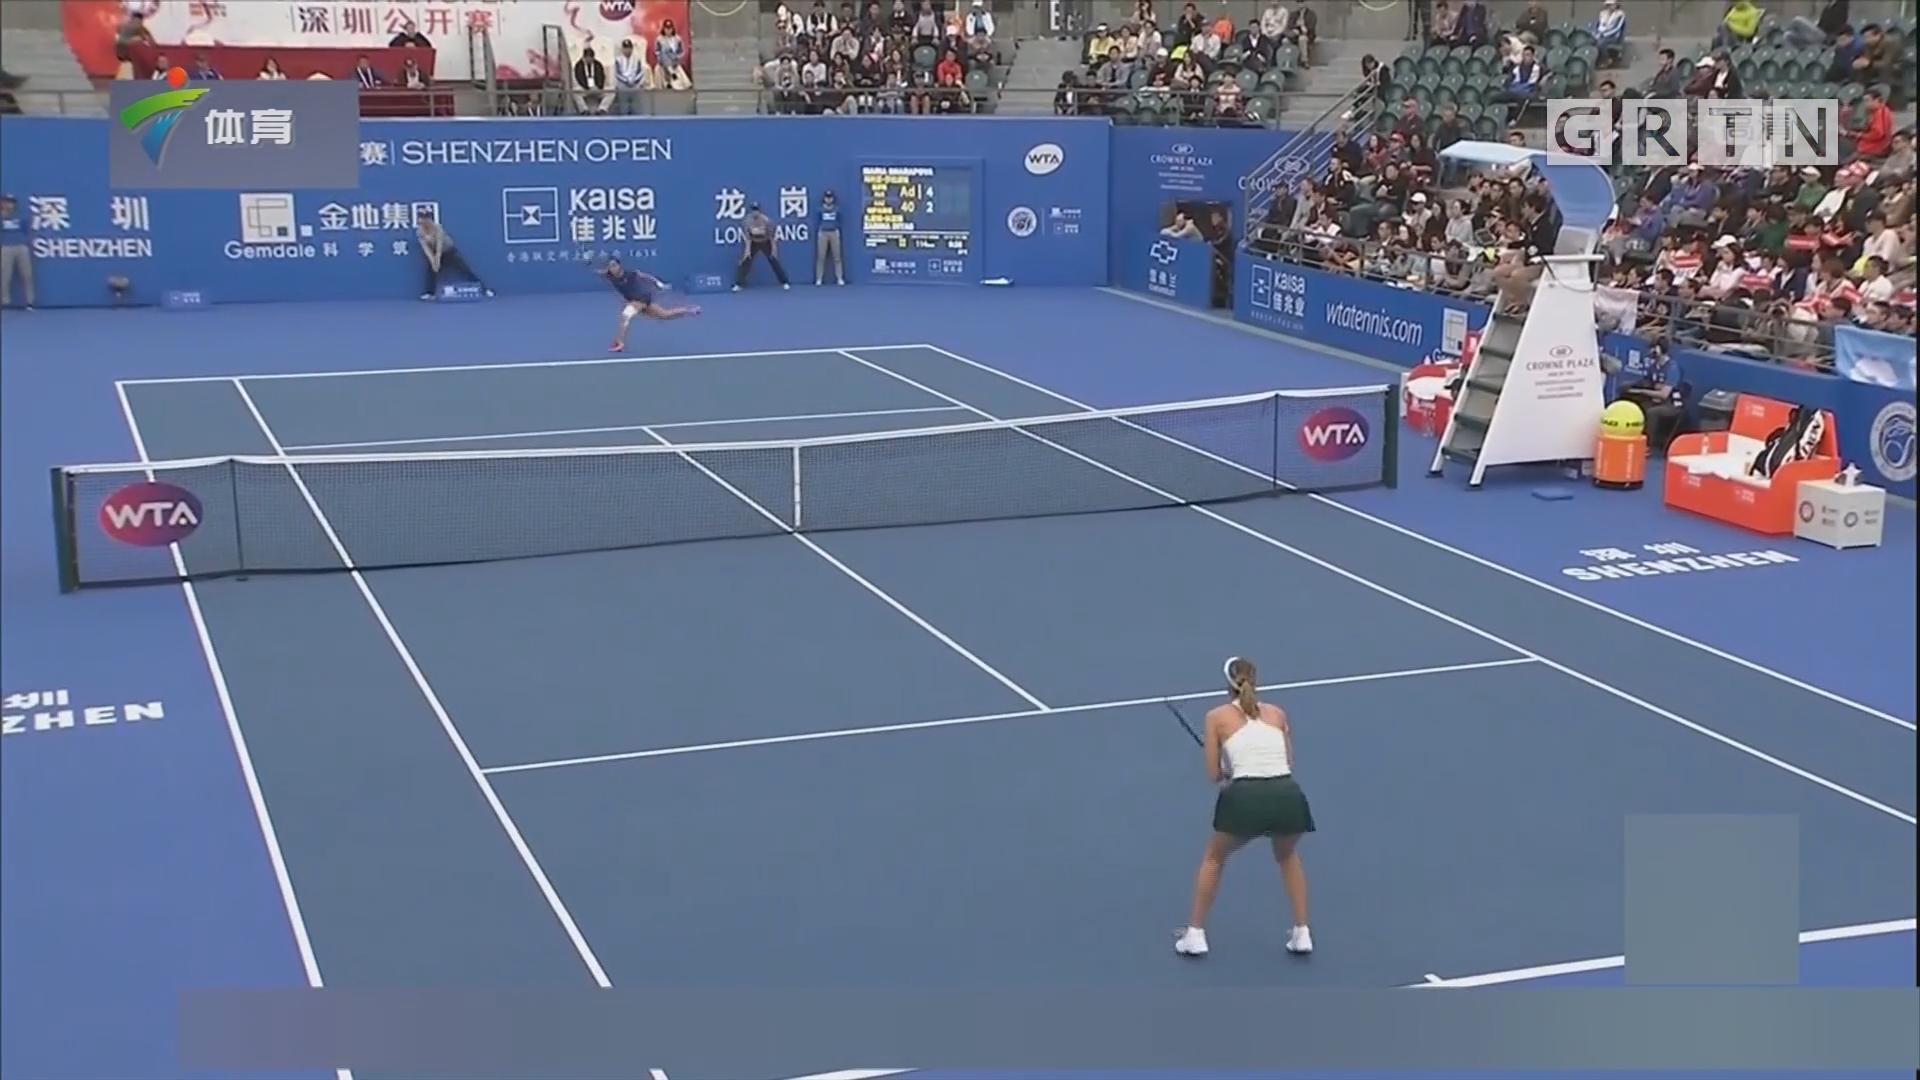 WTA深圳赛 莎拉波娃强势晋级